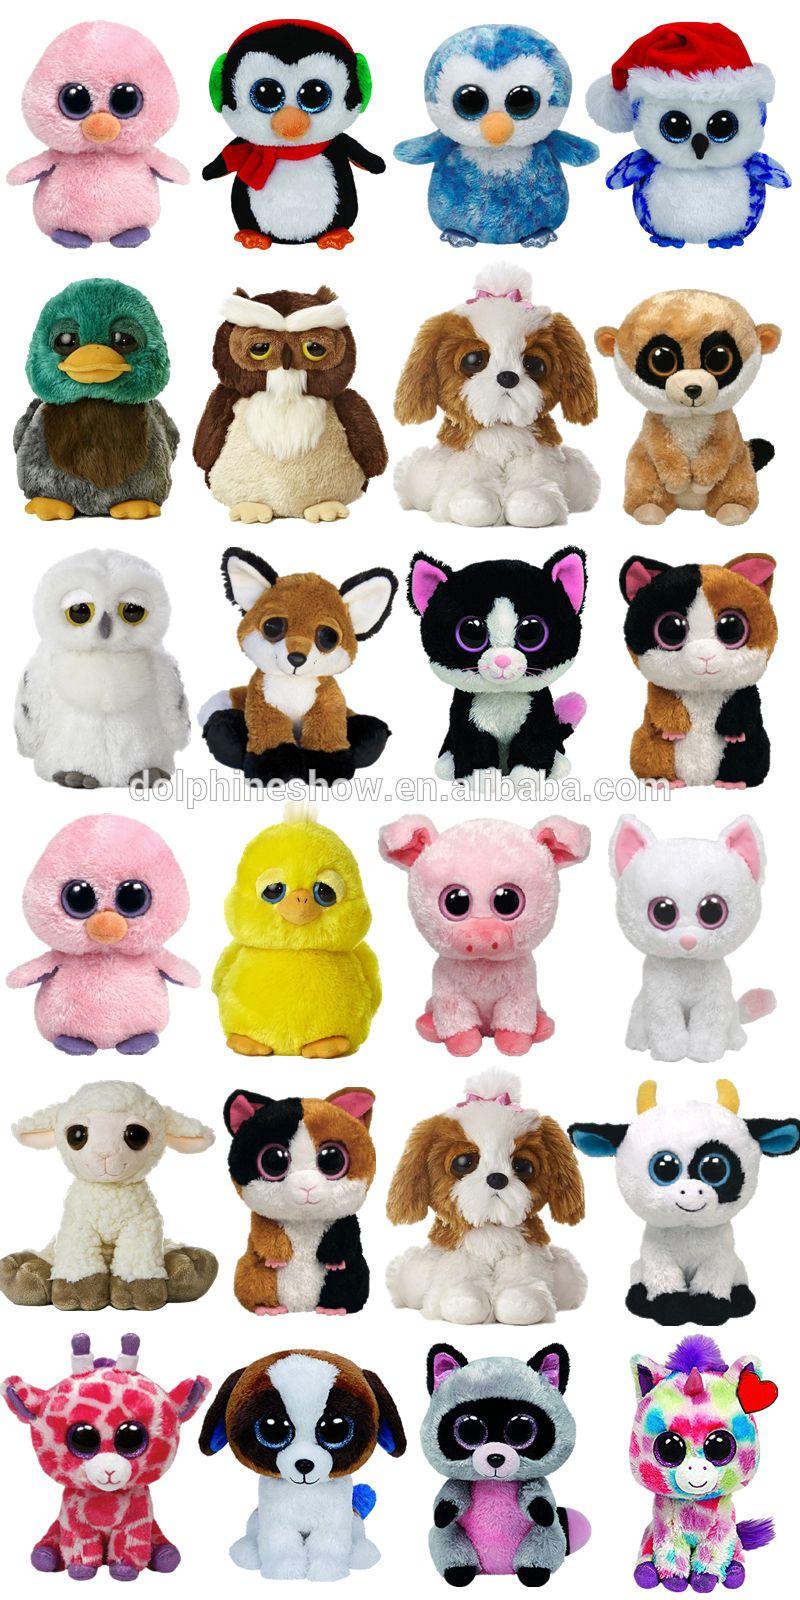 Ty Beanie Boos plush stuffed soft colorful deer toy Boo